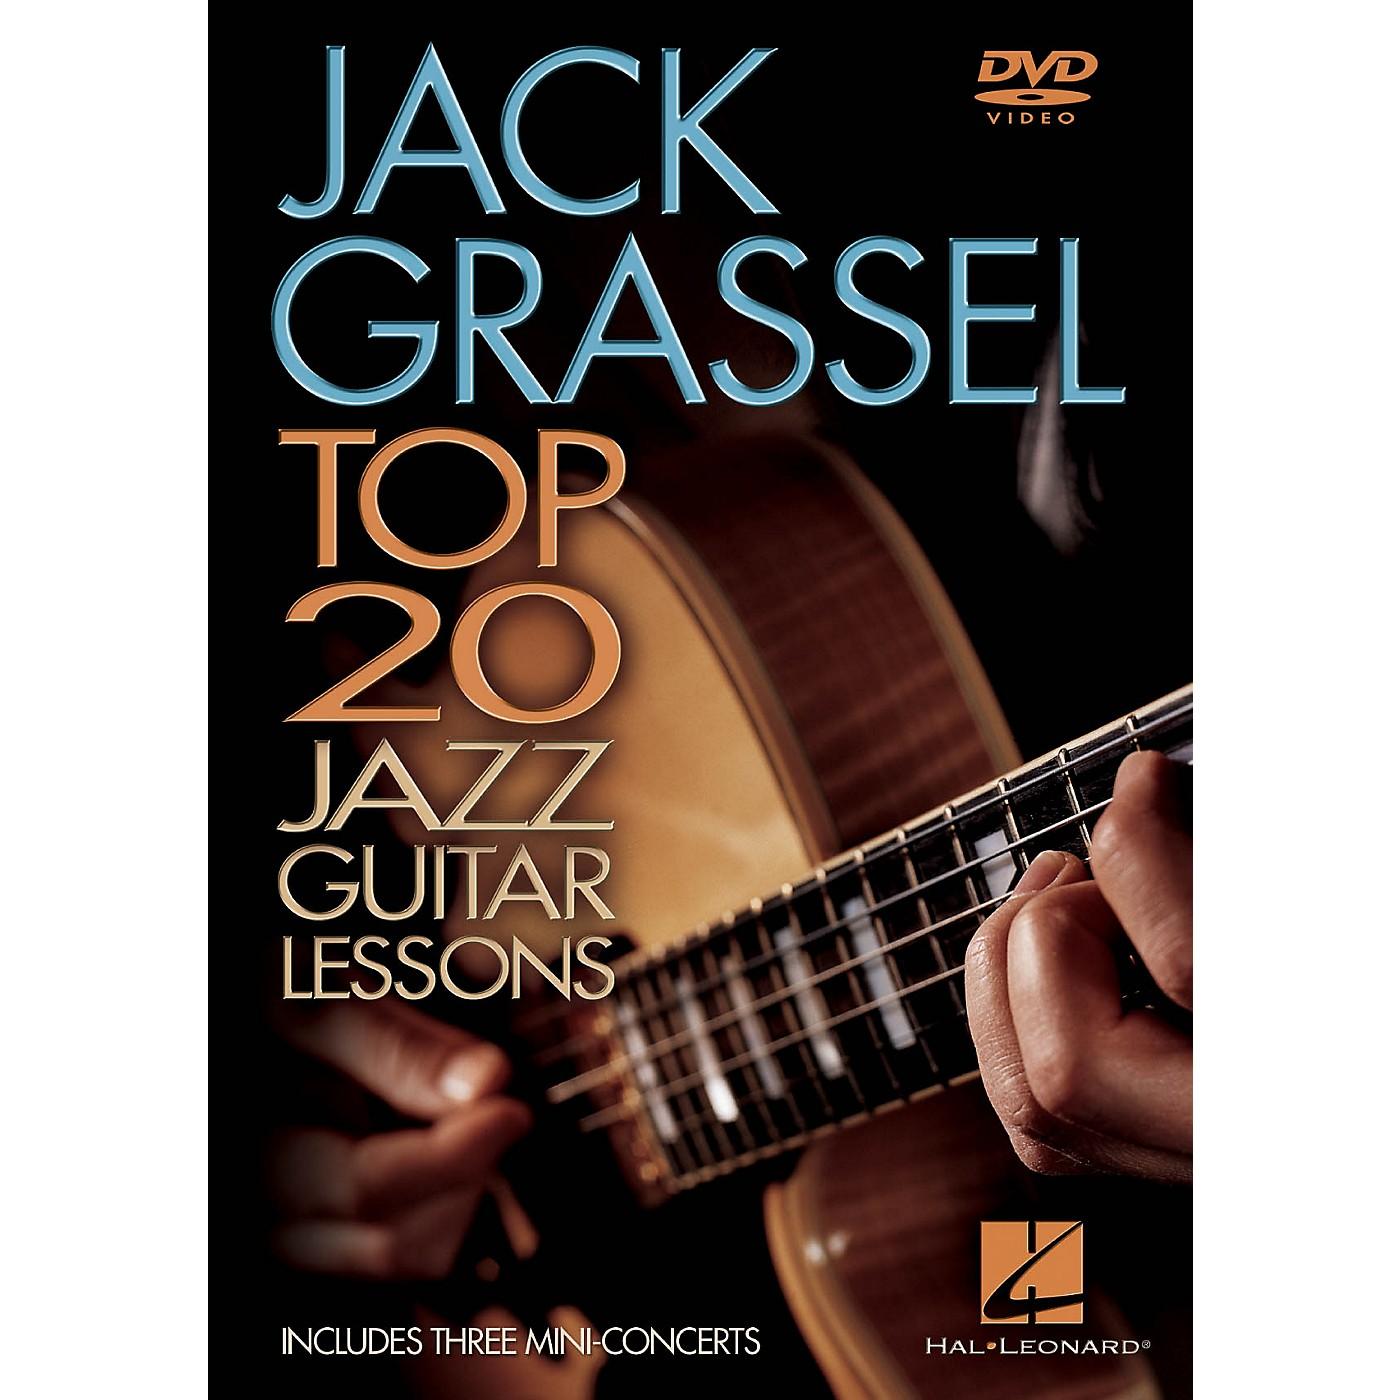 Hal Leonard Jack Grassel - Top 20 Jazz Guitar Lessons Instructional/Guitar/DVD Series DVD Performed by Jack Grassel thumbnail